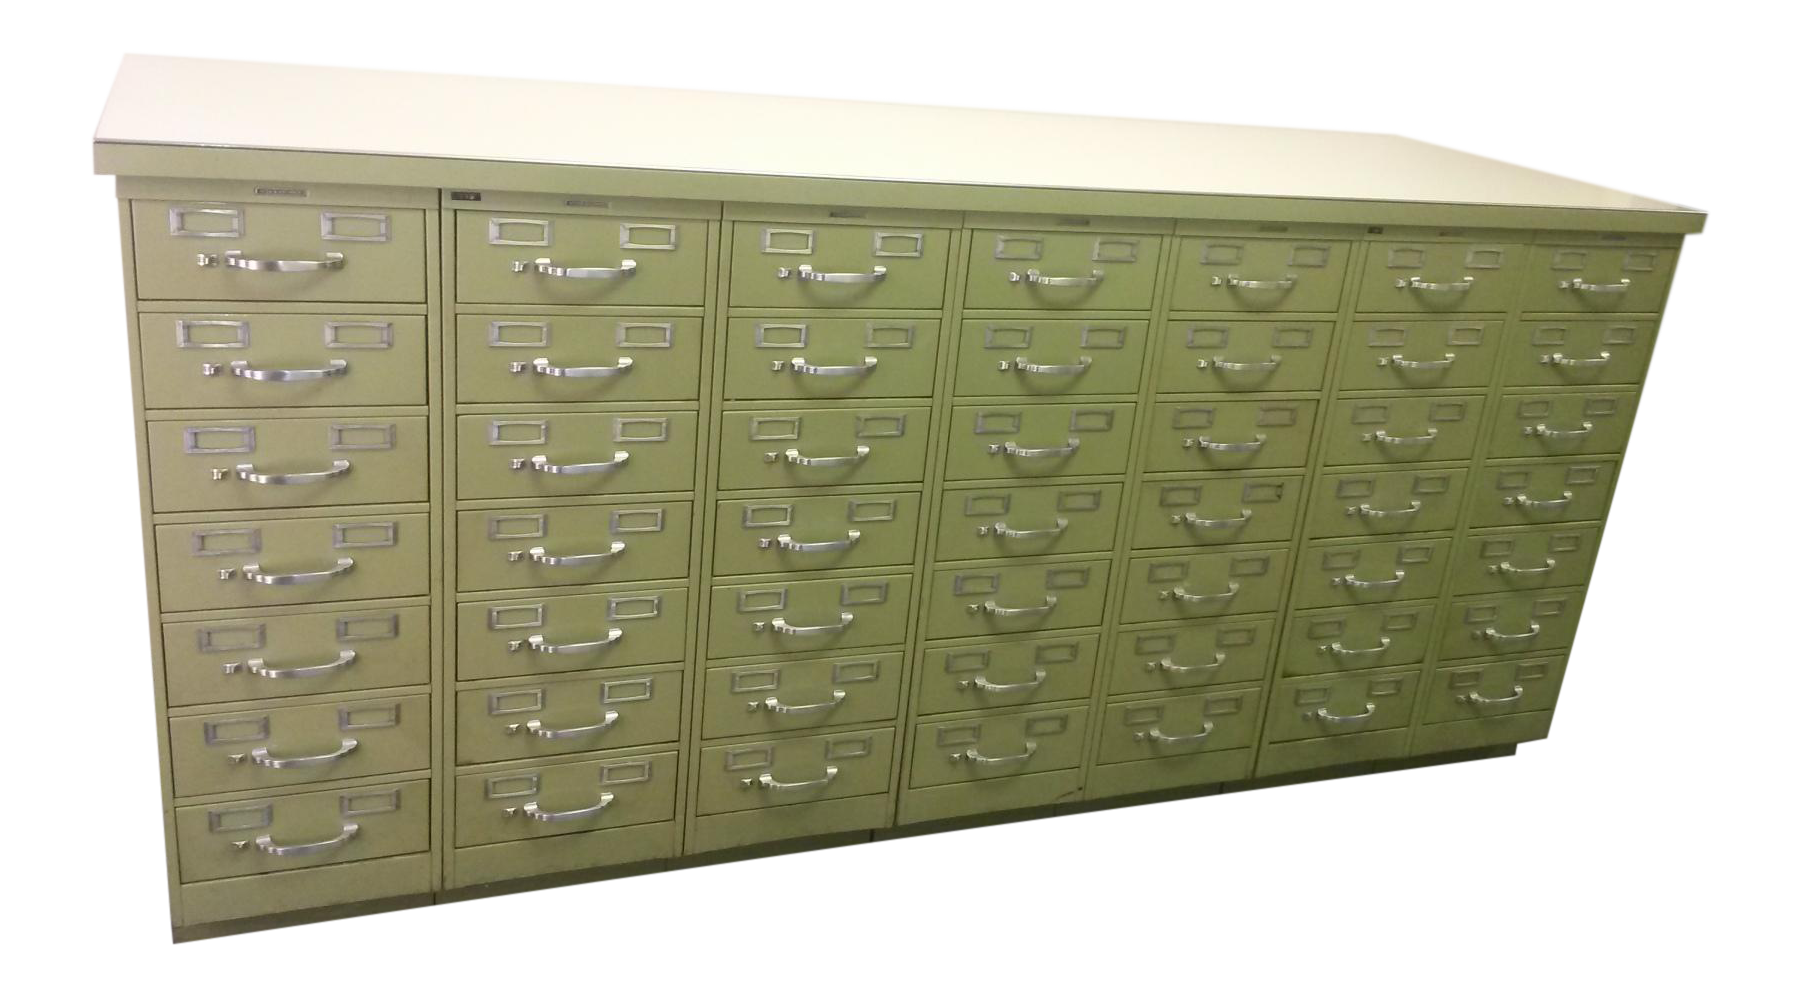 Vintage Industrial Steelcase Index Card Filing Cabinet Set\